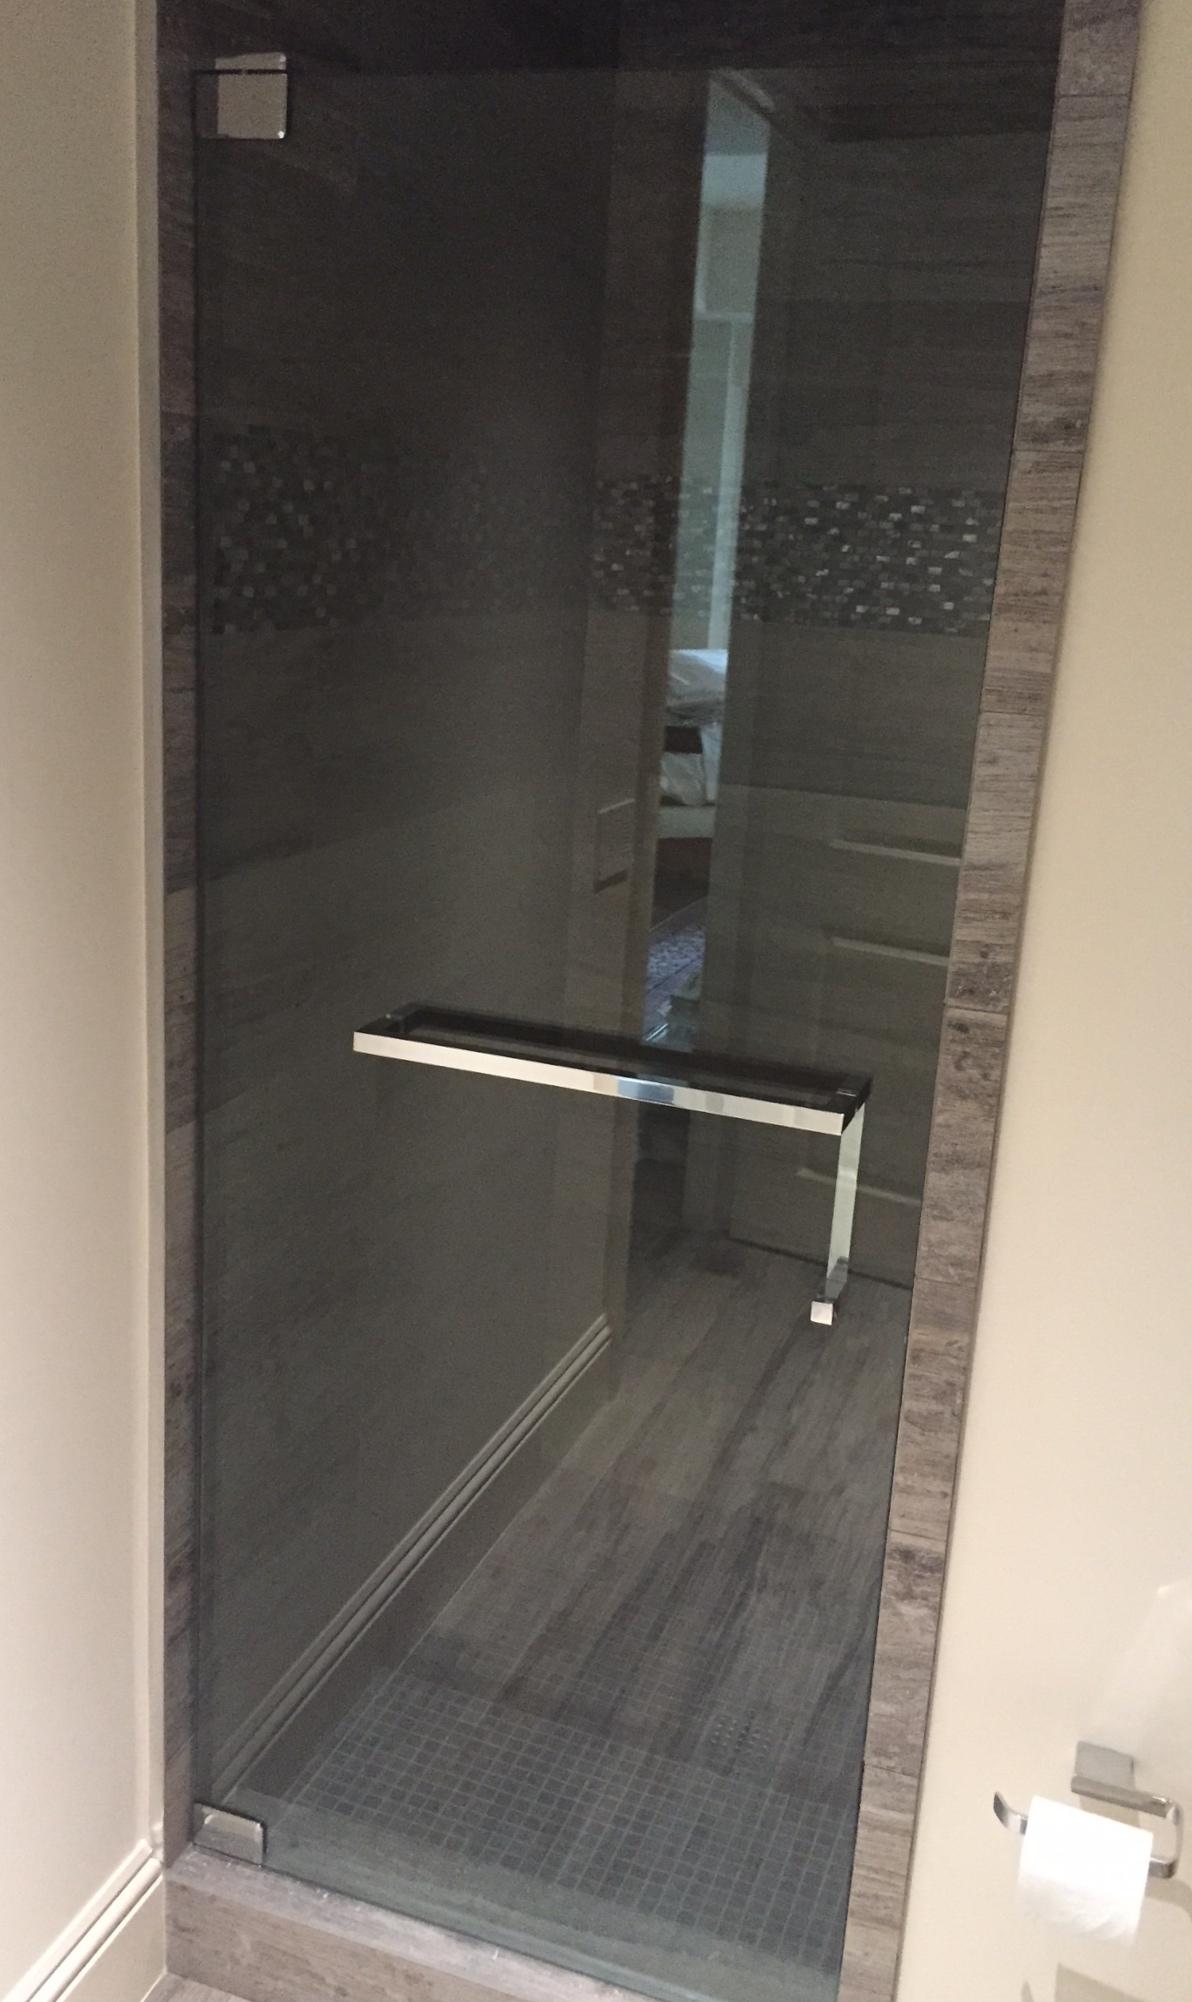 Chrome Sliding Shower Door Towel Bar Bracket1192 X 2002